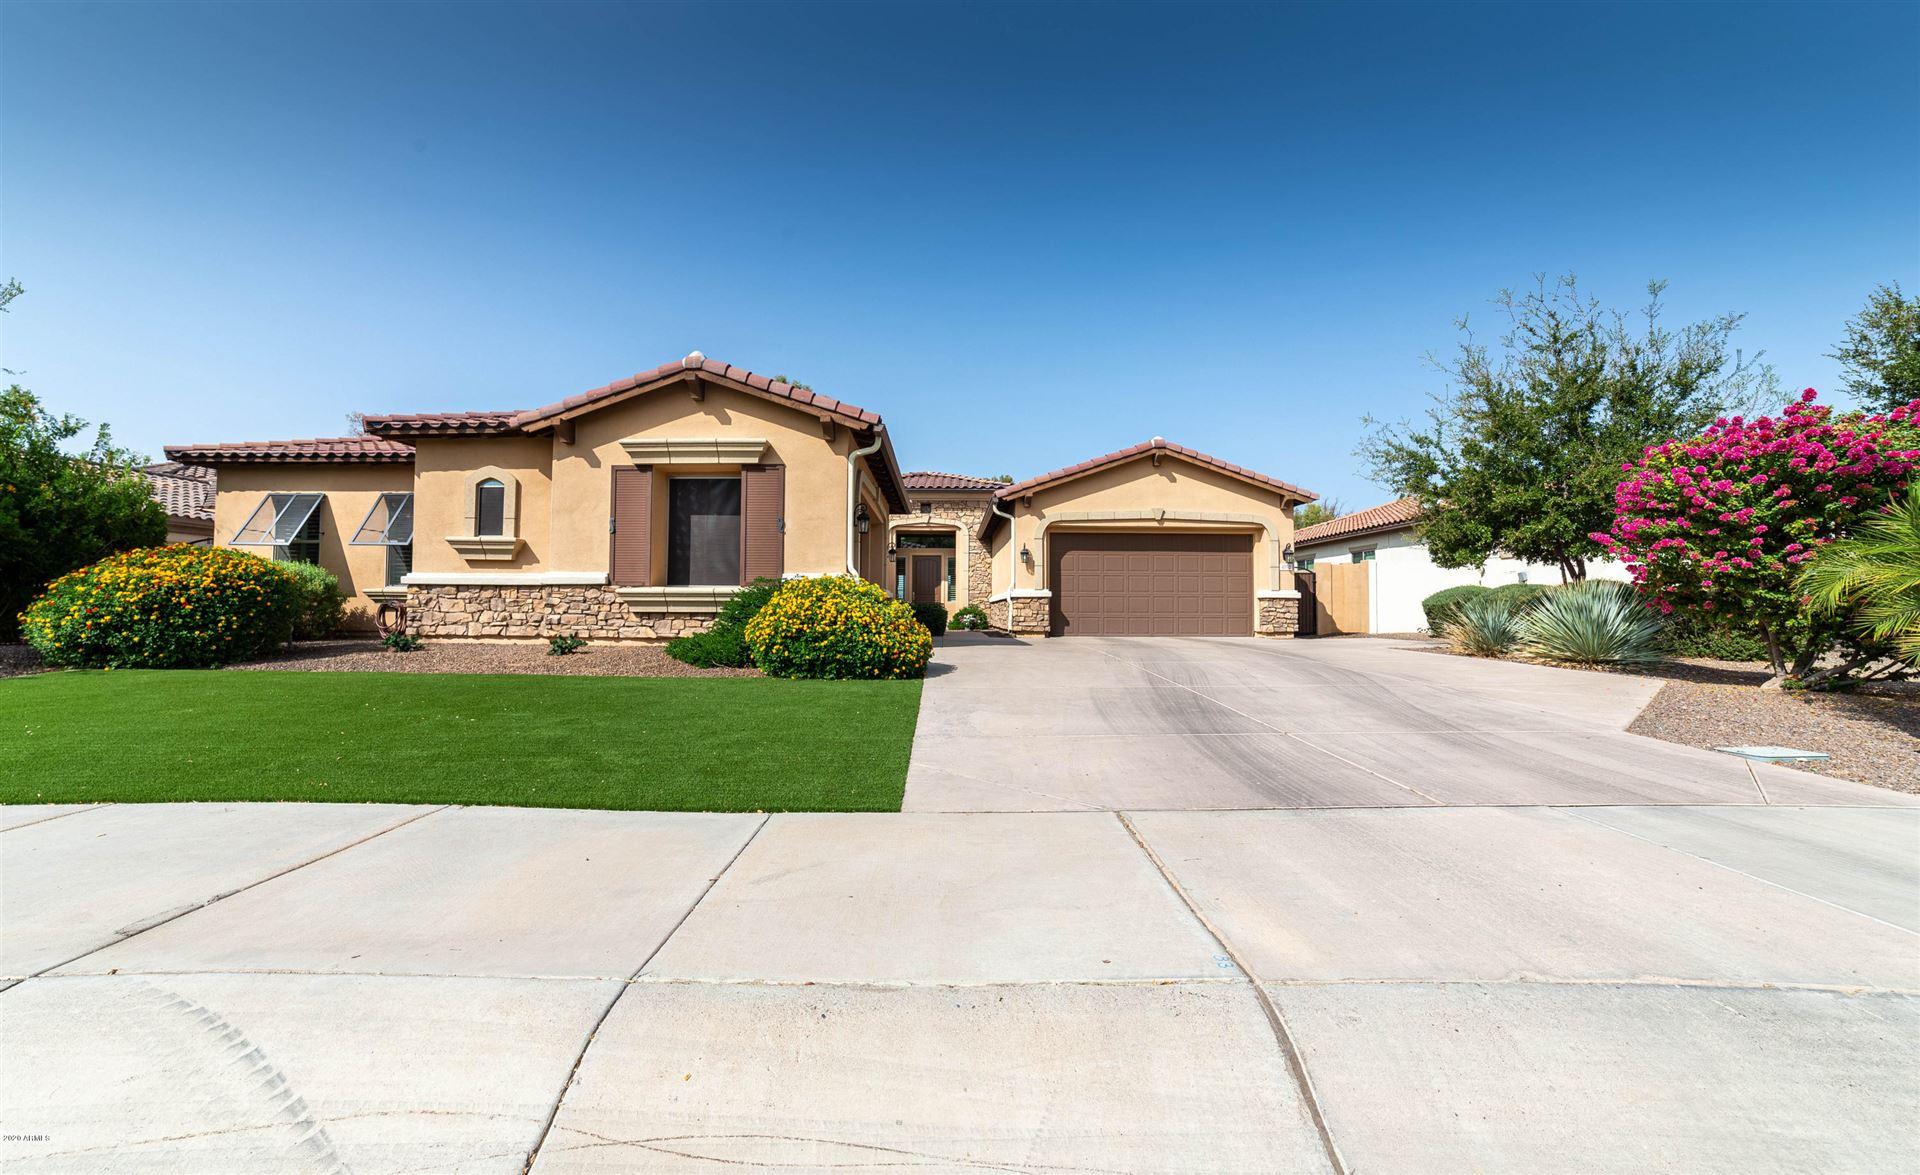 4792 N BARRANCO Drive, Litchfield Park, AZ 85340 - MLS#: 6133902